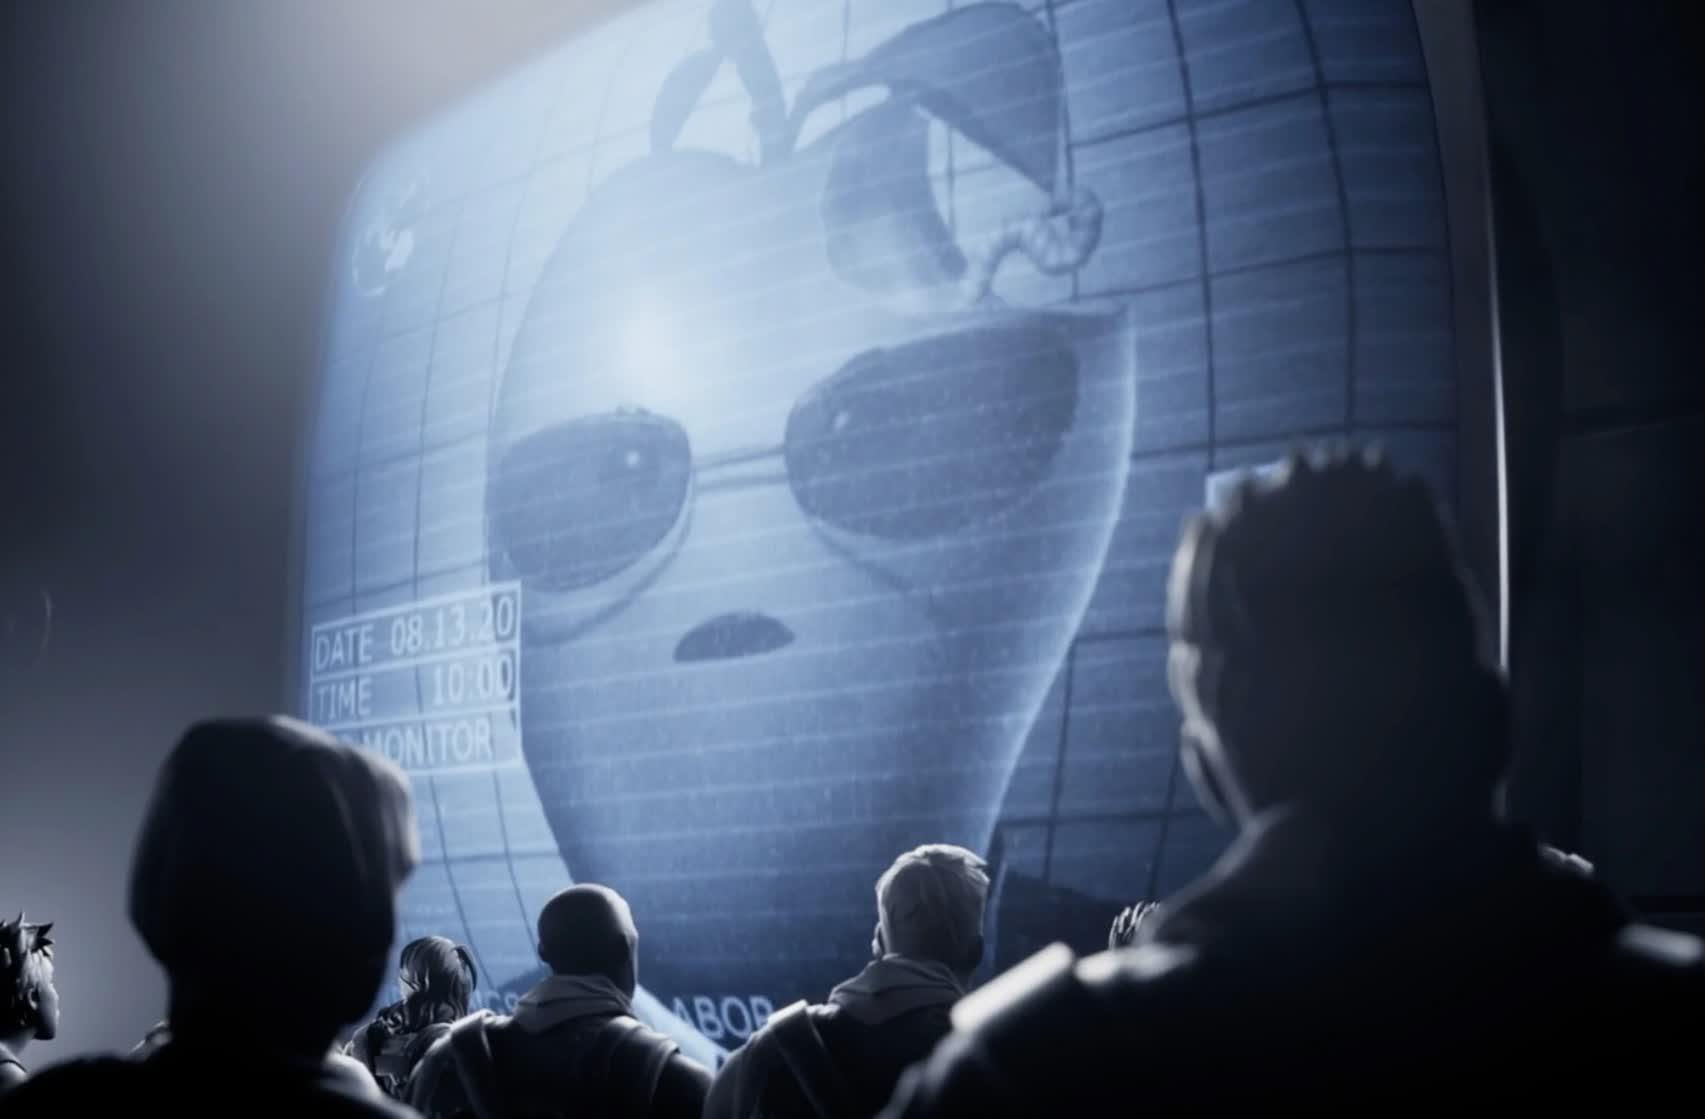 UK regulator to investigate Apple's App Store ToC over alleged anticompetitive behavior